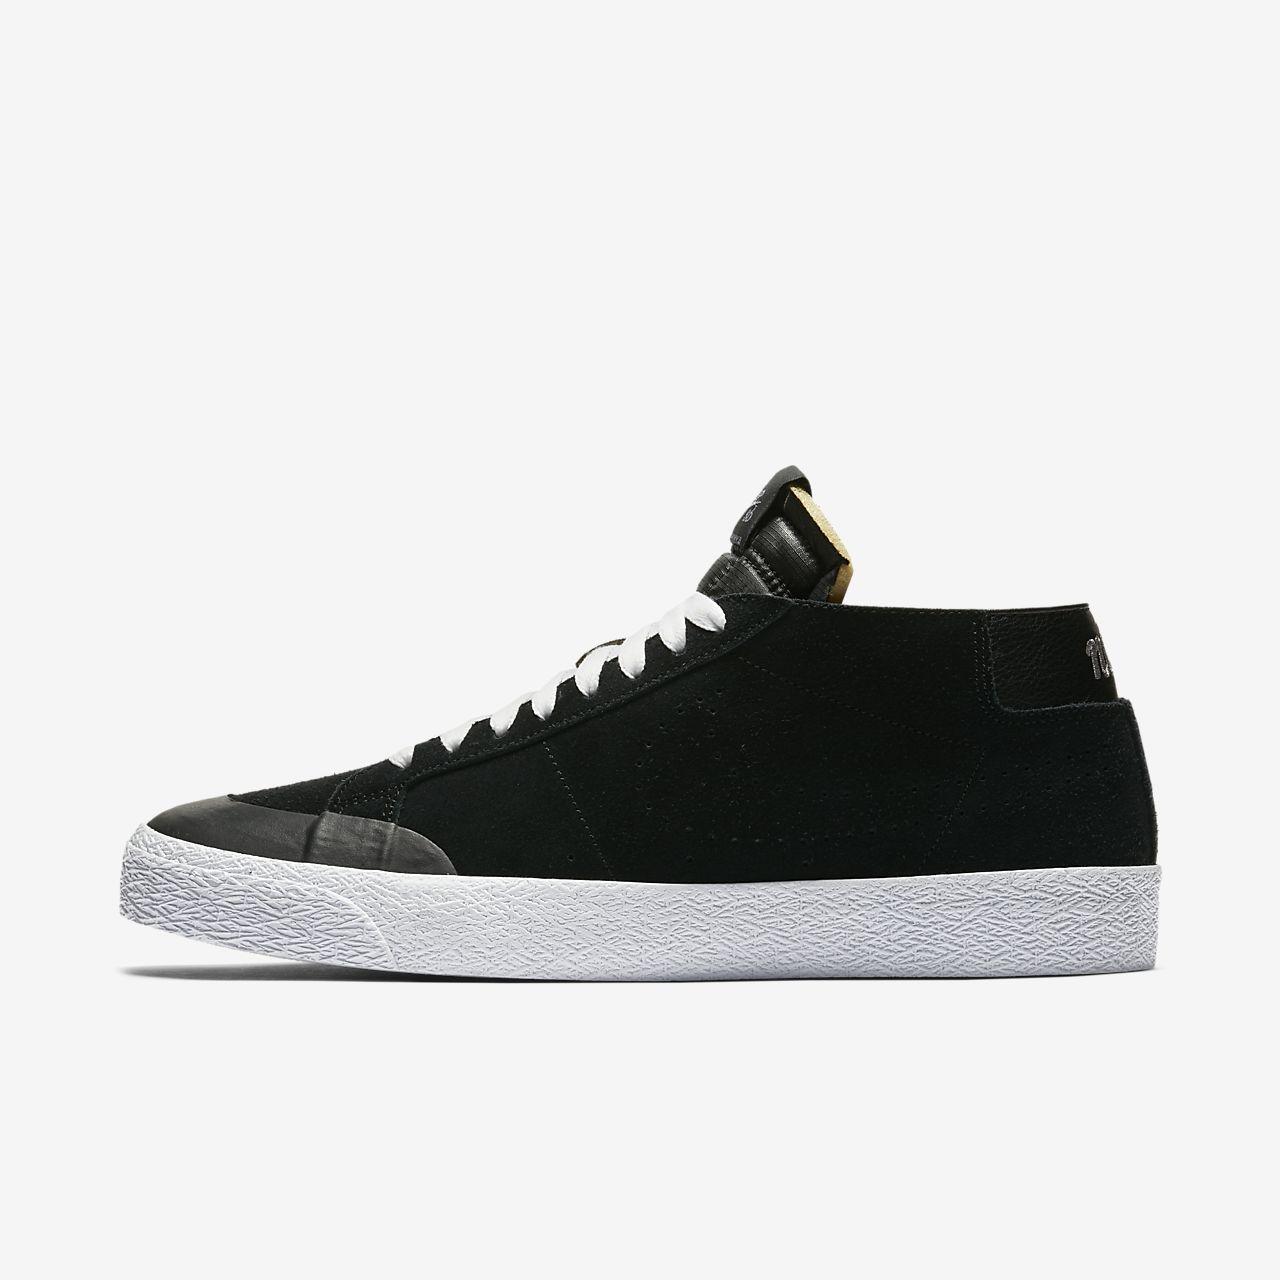 official photos 02ce5 c2a08 Nike SB Zoom Blazer Chukka XT-skatersko til mænd